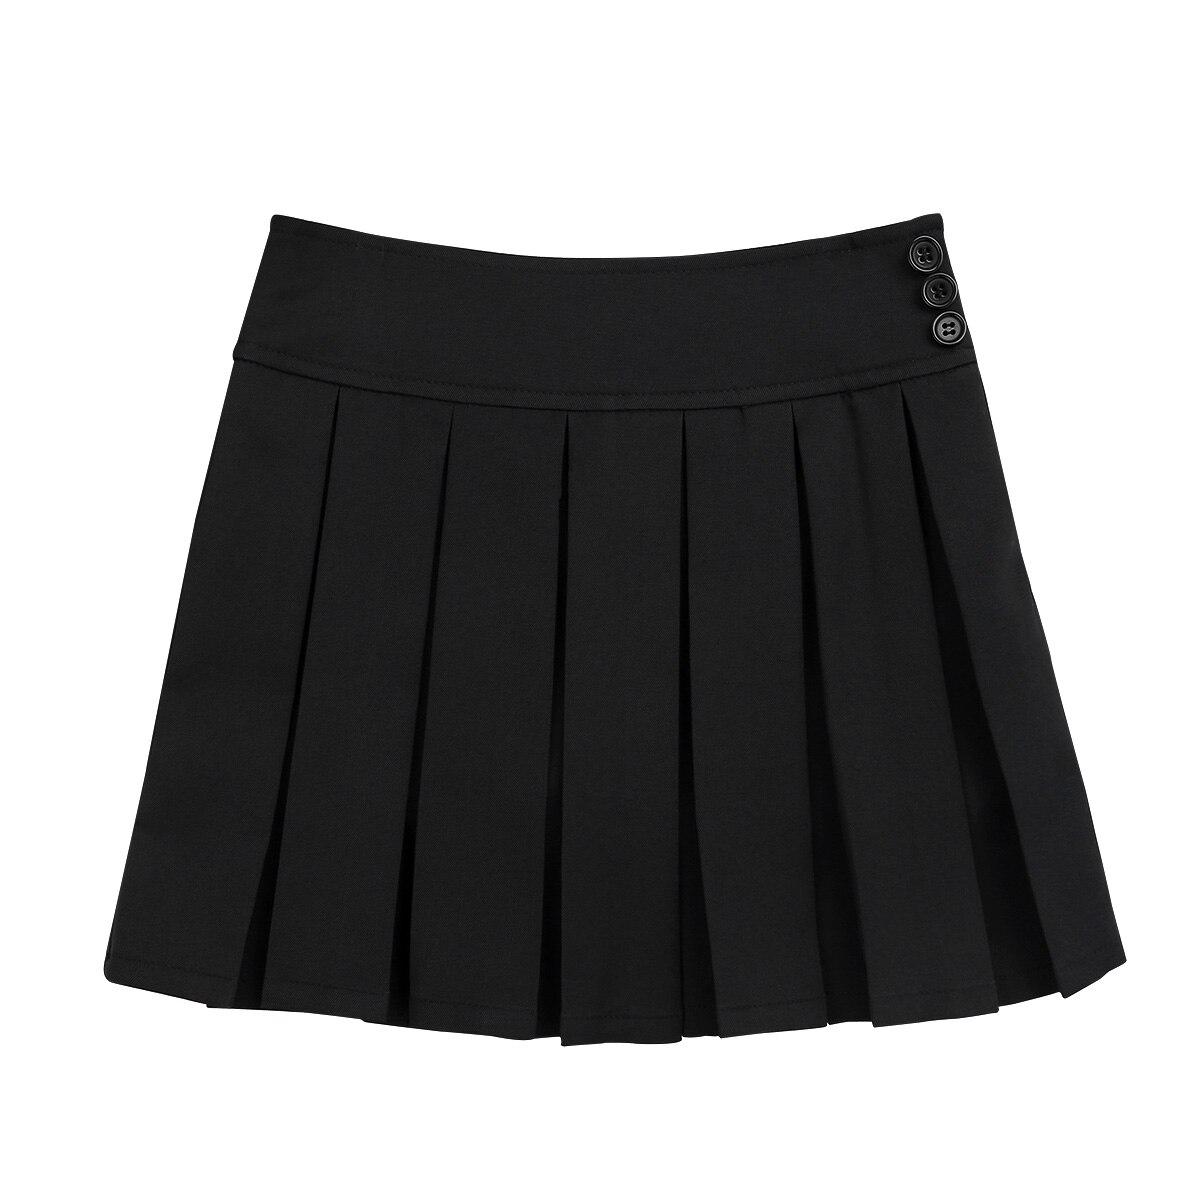 Iiniim Kinder Mädchen Schuluniform Plissee Side Zipper Buttons Roller Dance Rock mit Versteckte Shorts Schule Rock